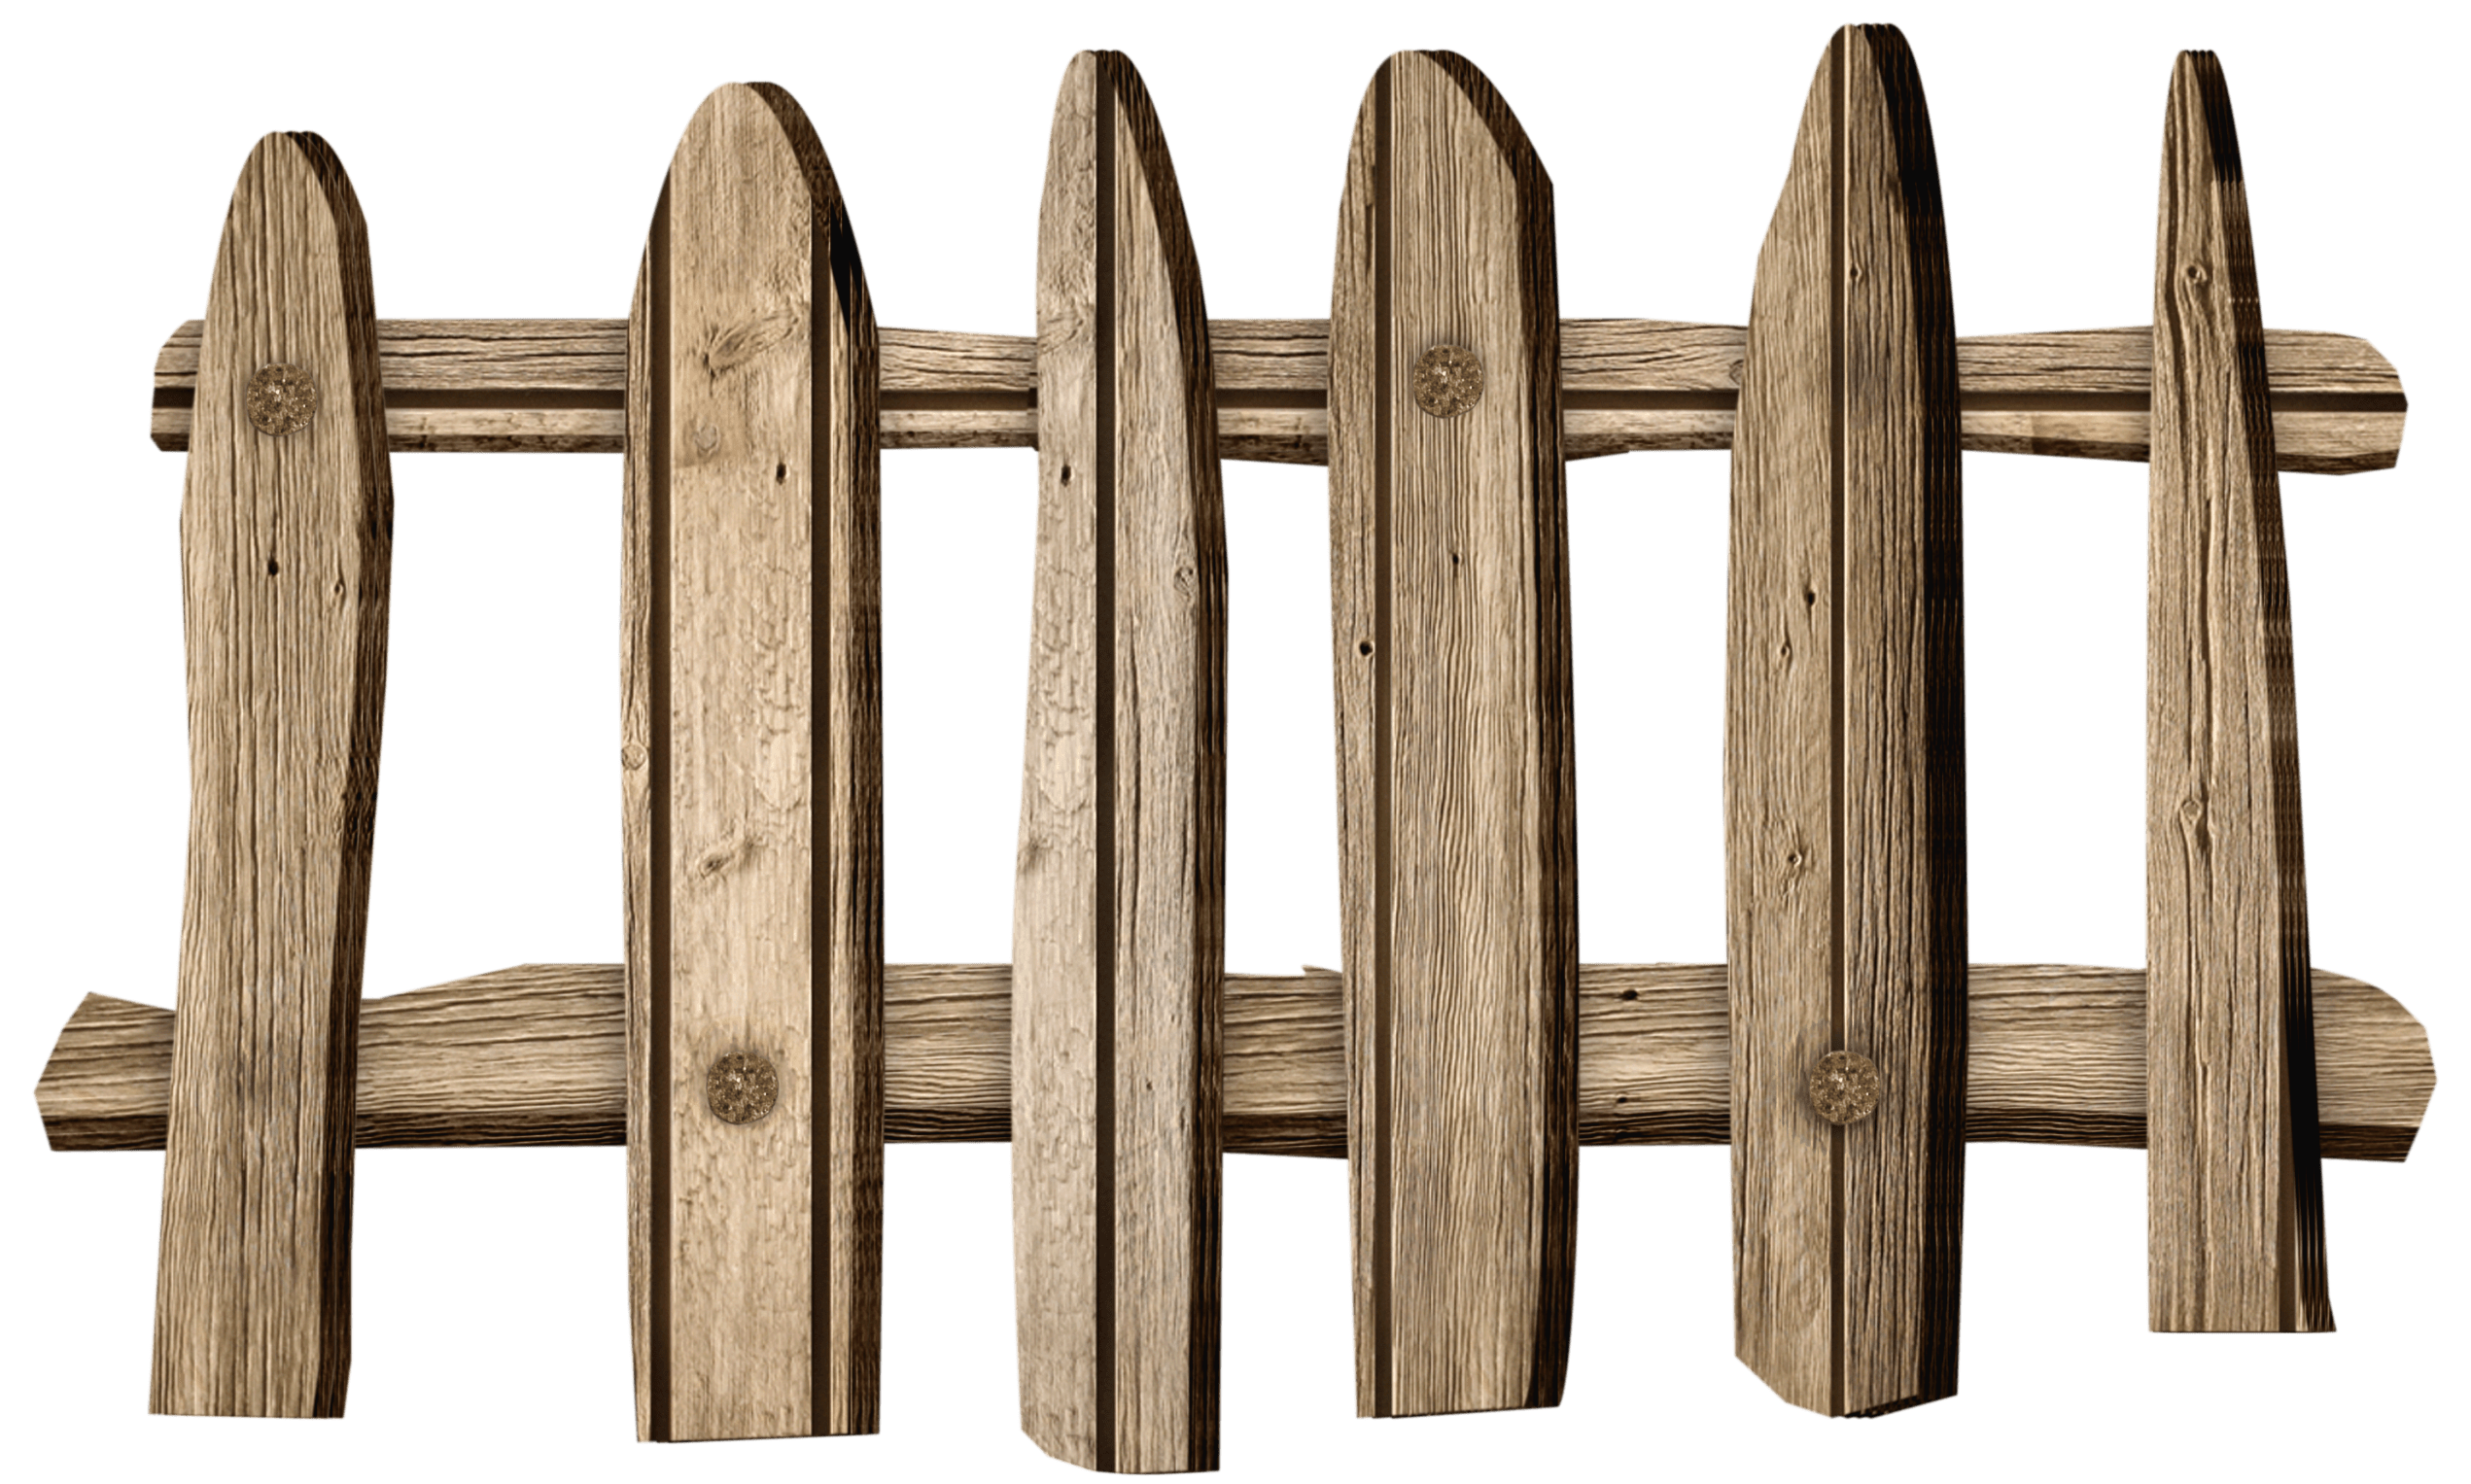 Vieux Portail En Bois vieux portail en bois png transparents - stickpng